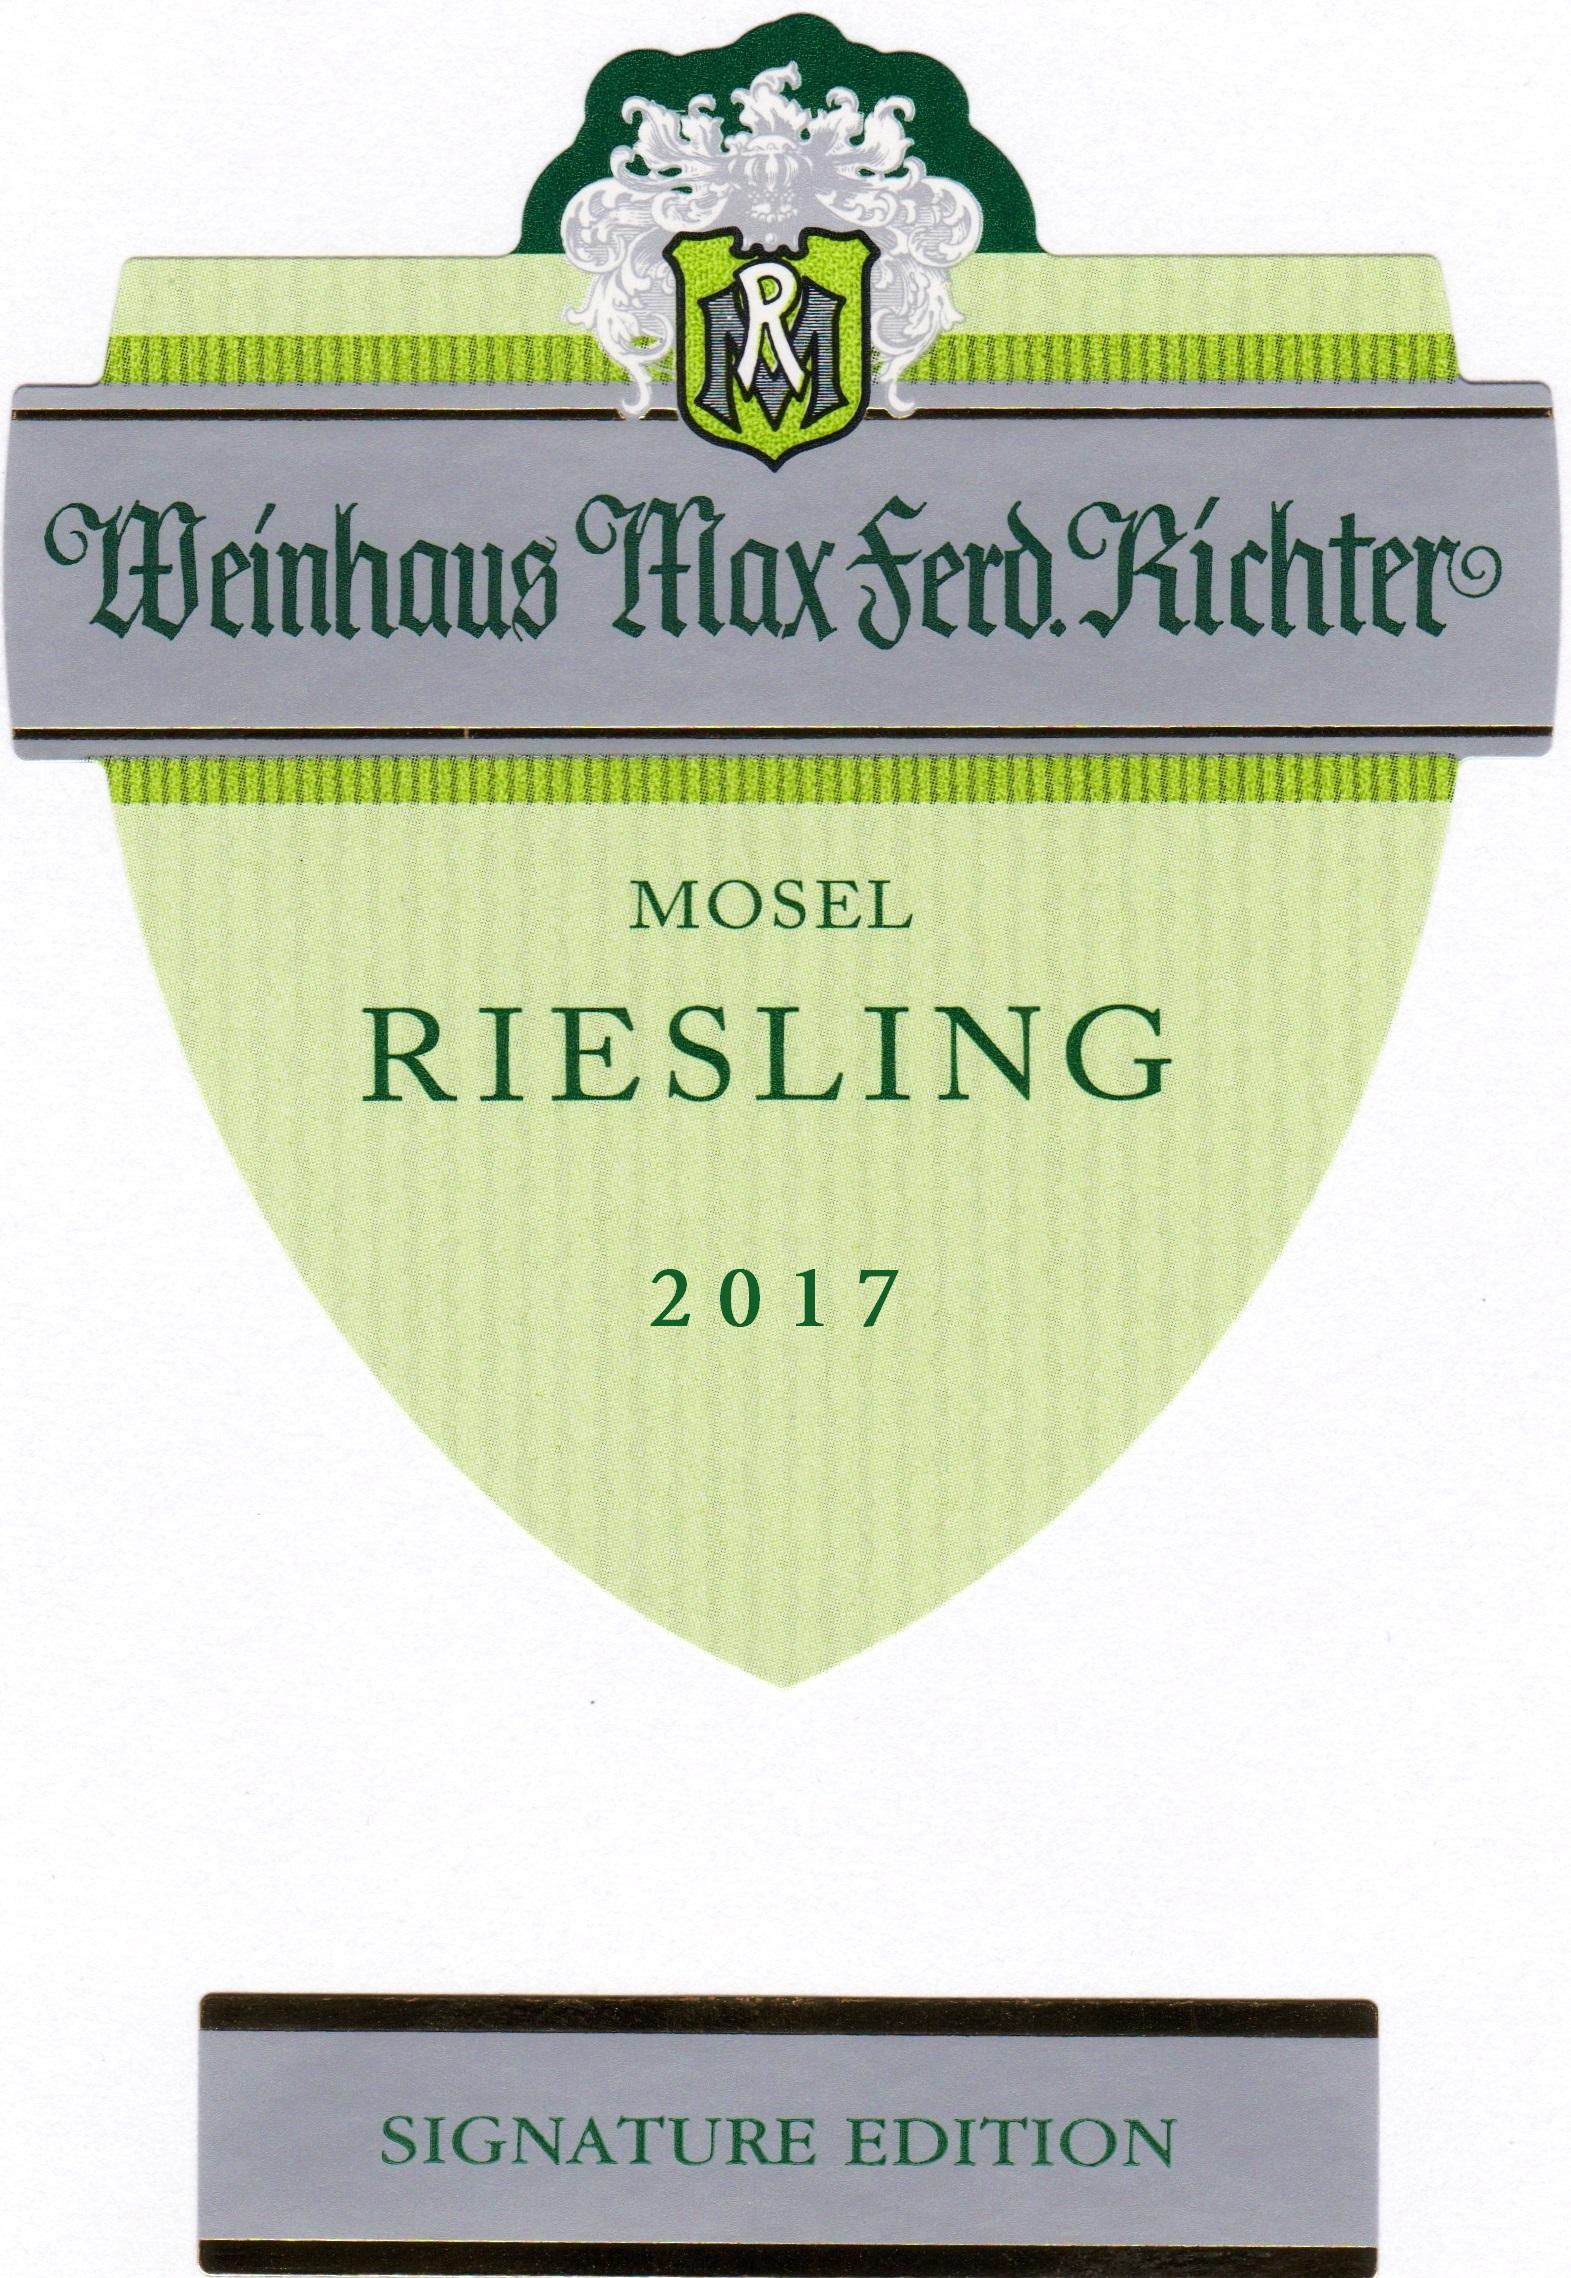 2017 Signature Edition, Qualitätswein.jpg